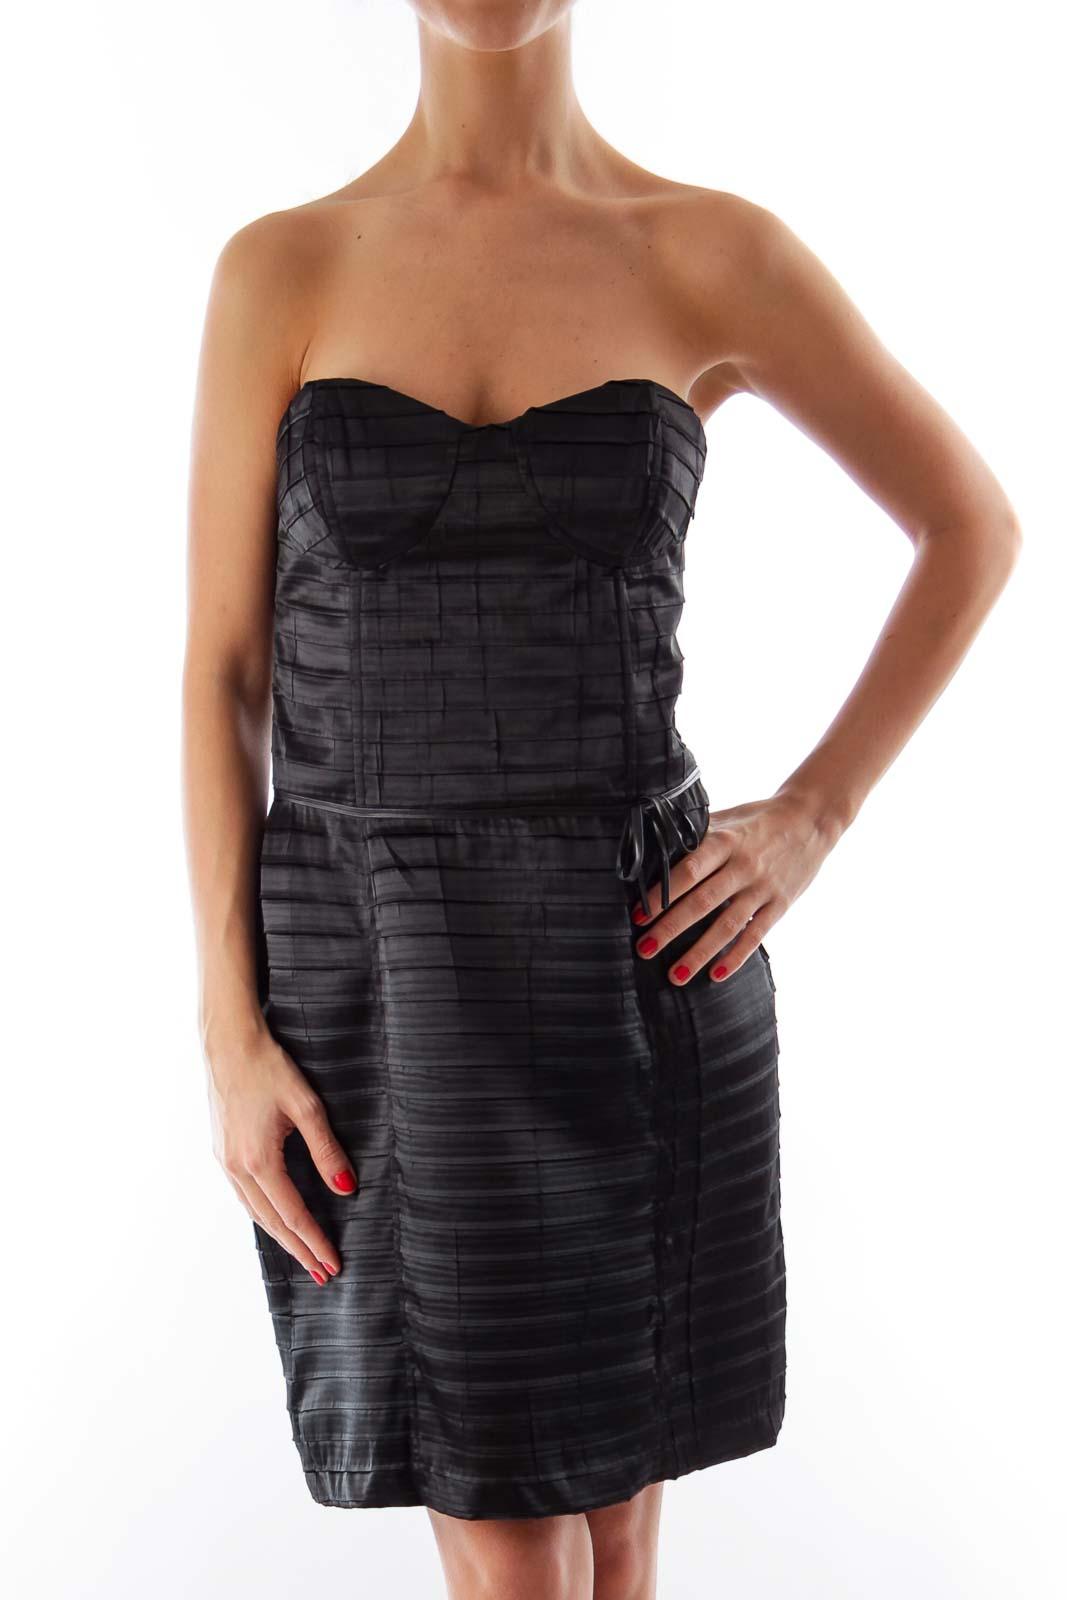 Black Strapless Corset Mini Dress Front